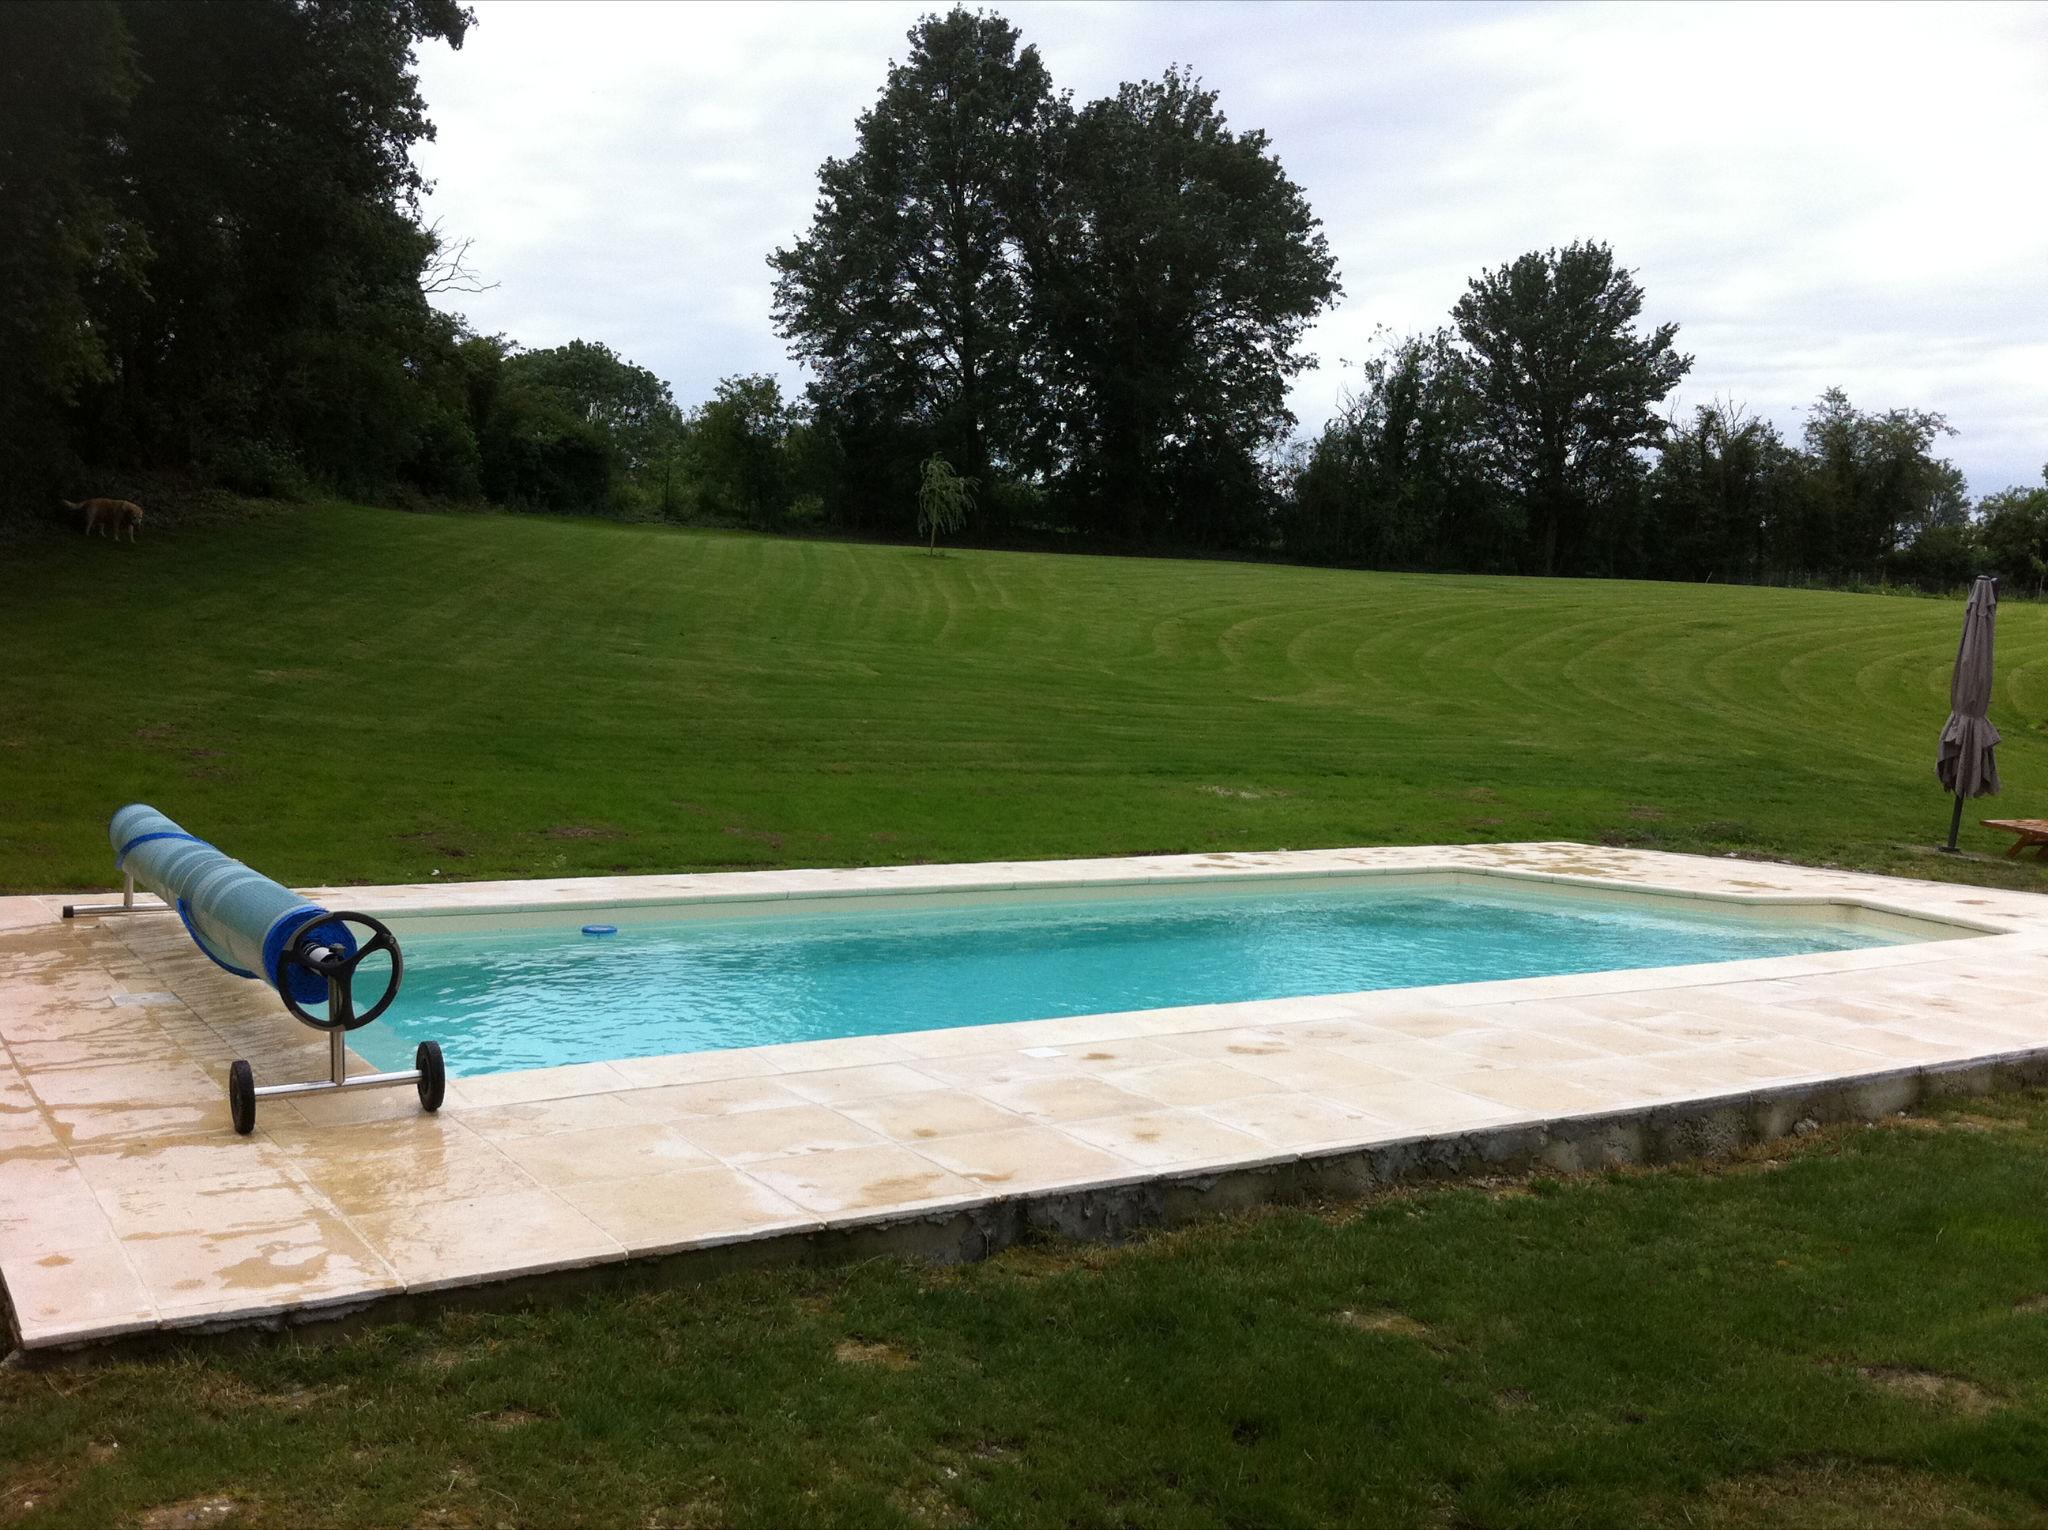 Piscine coque cara ba 3 picardie piscine for Bassin piscine polyester